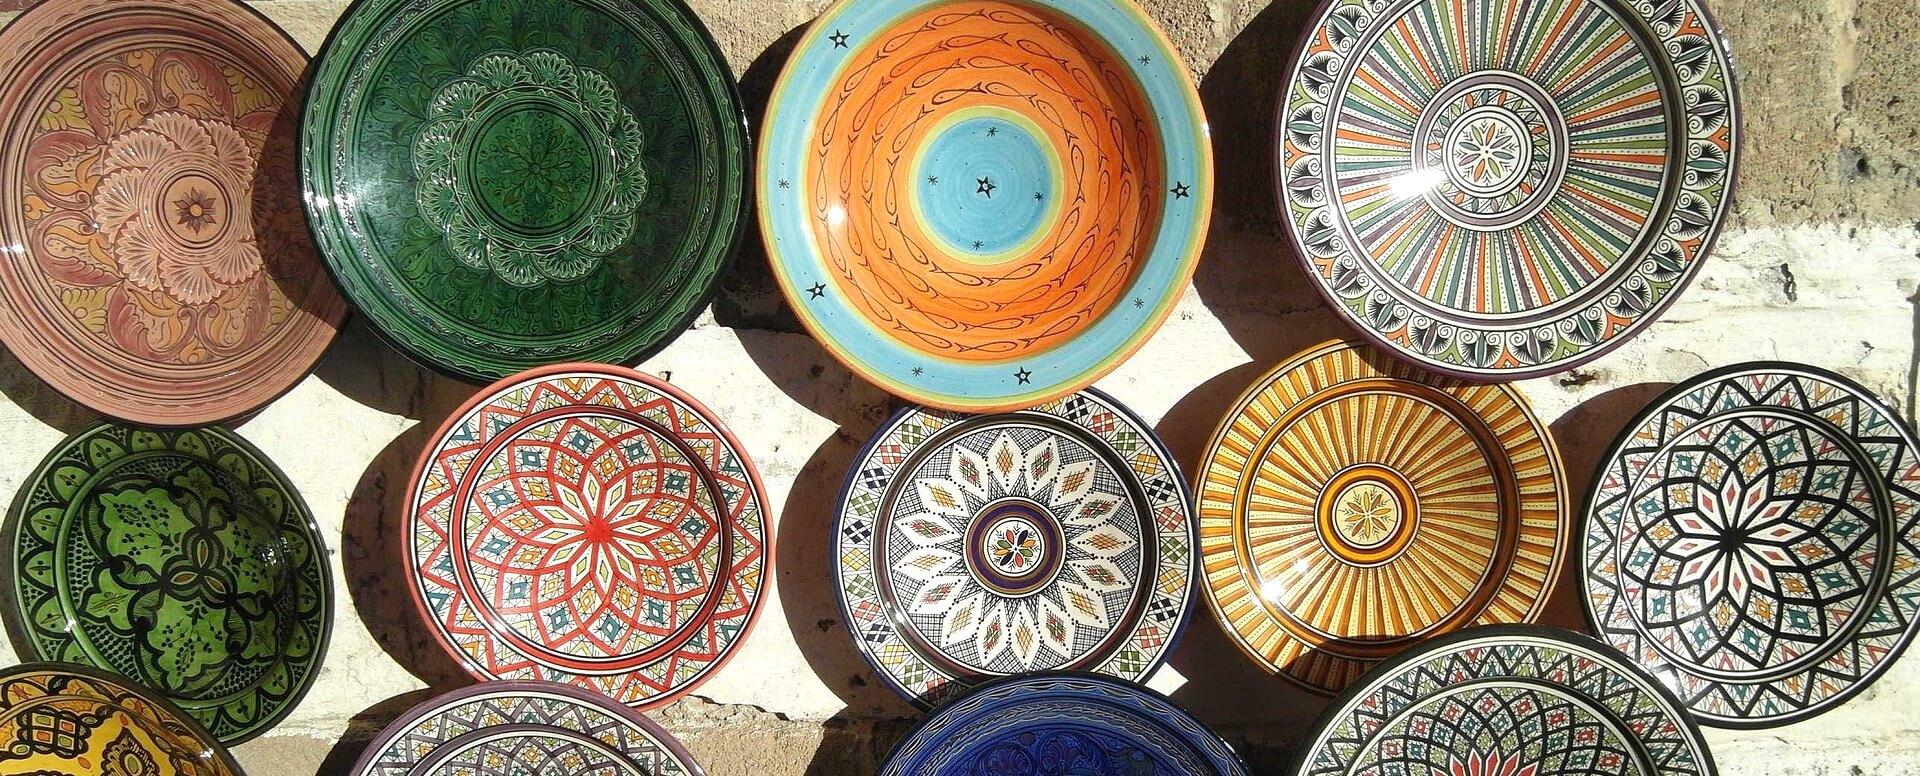 Le musée Sidi Mohammed Ben Abdellah - Essaouira